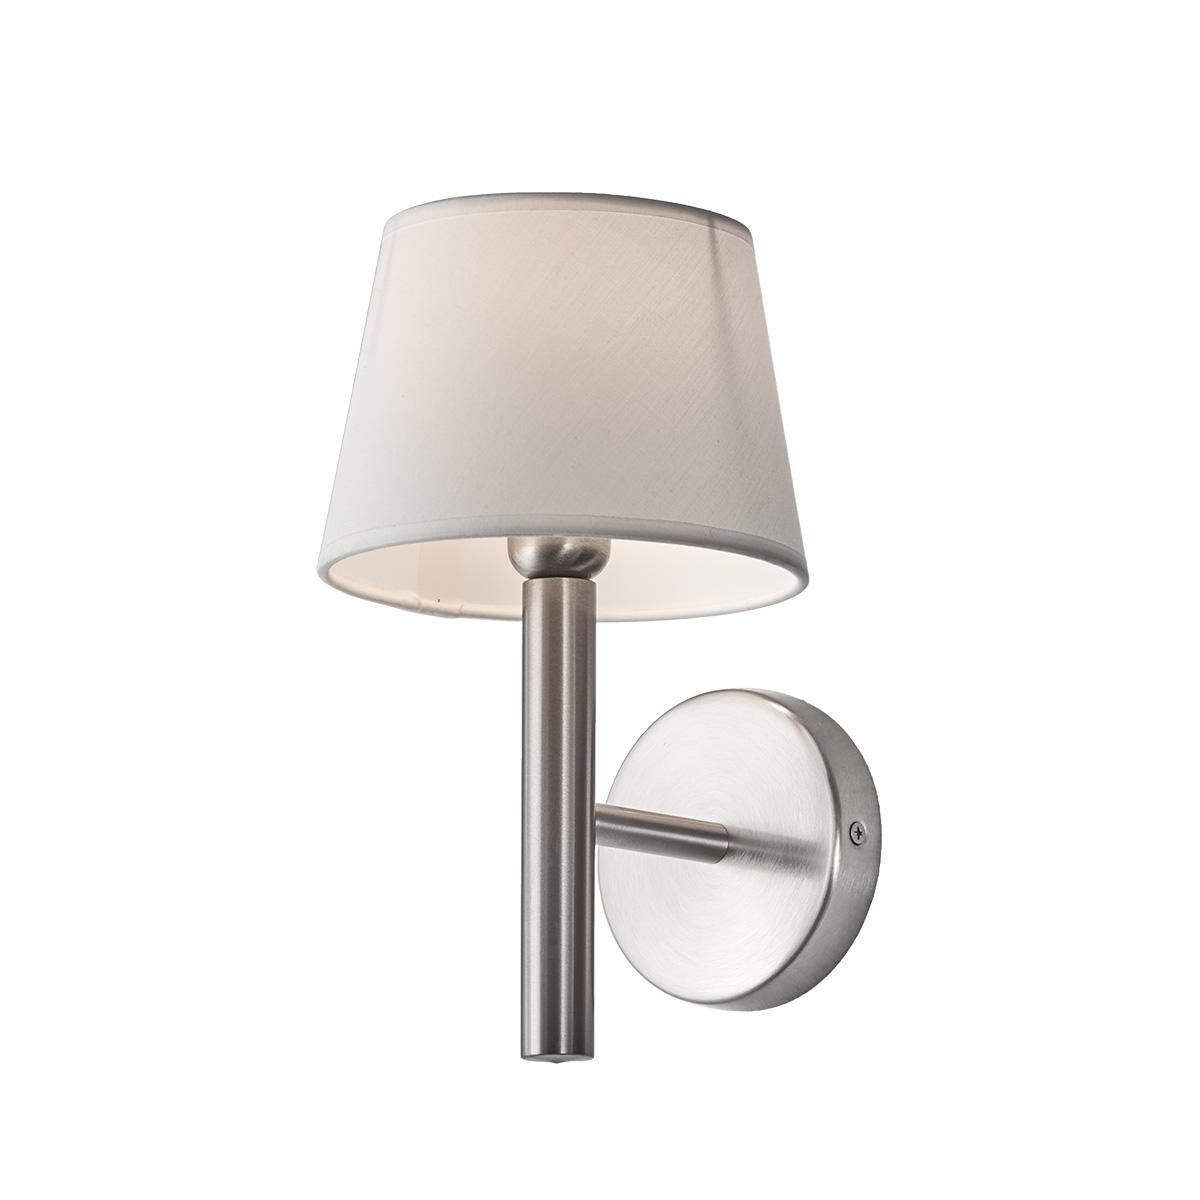 Inox απλίκα με καπέλο ΙΟΝΙΟ inox wall lamp